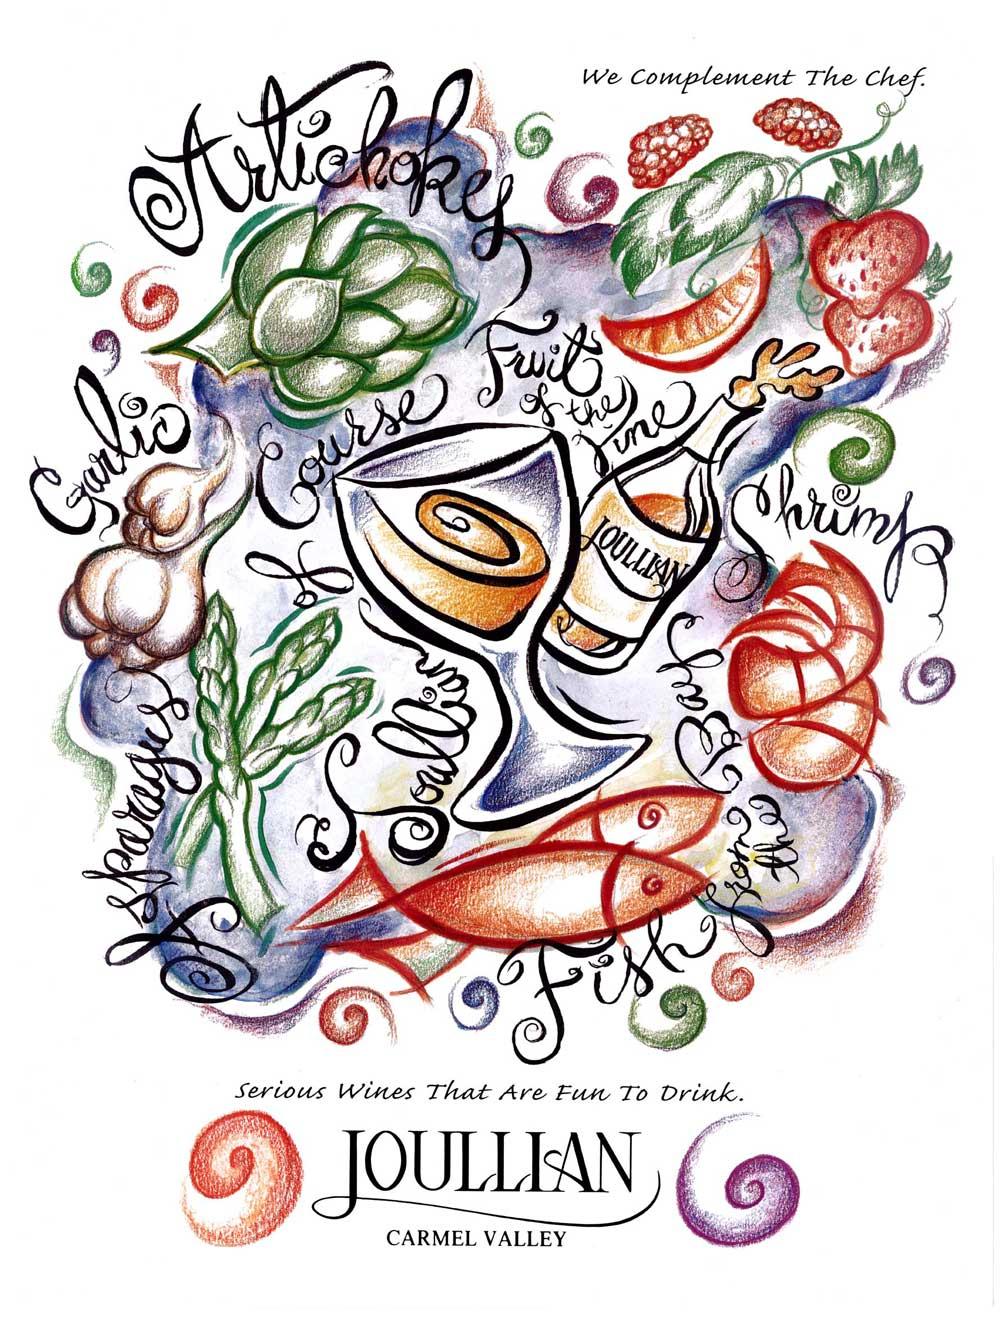 Joullian Poster & Ad for Dining Magazine   Client:  Joullian Vineyards via Jordan Associates  Medium:   Mixed Media